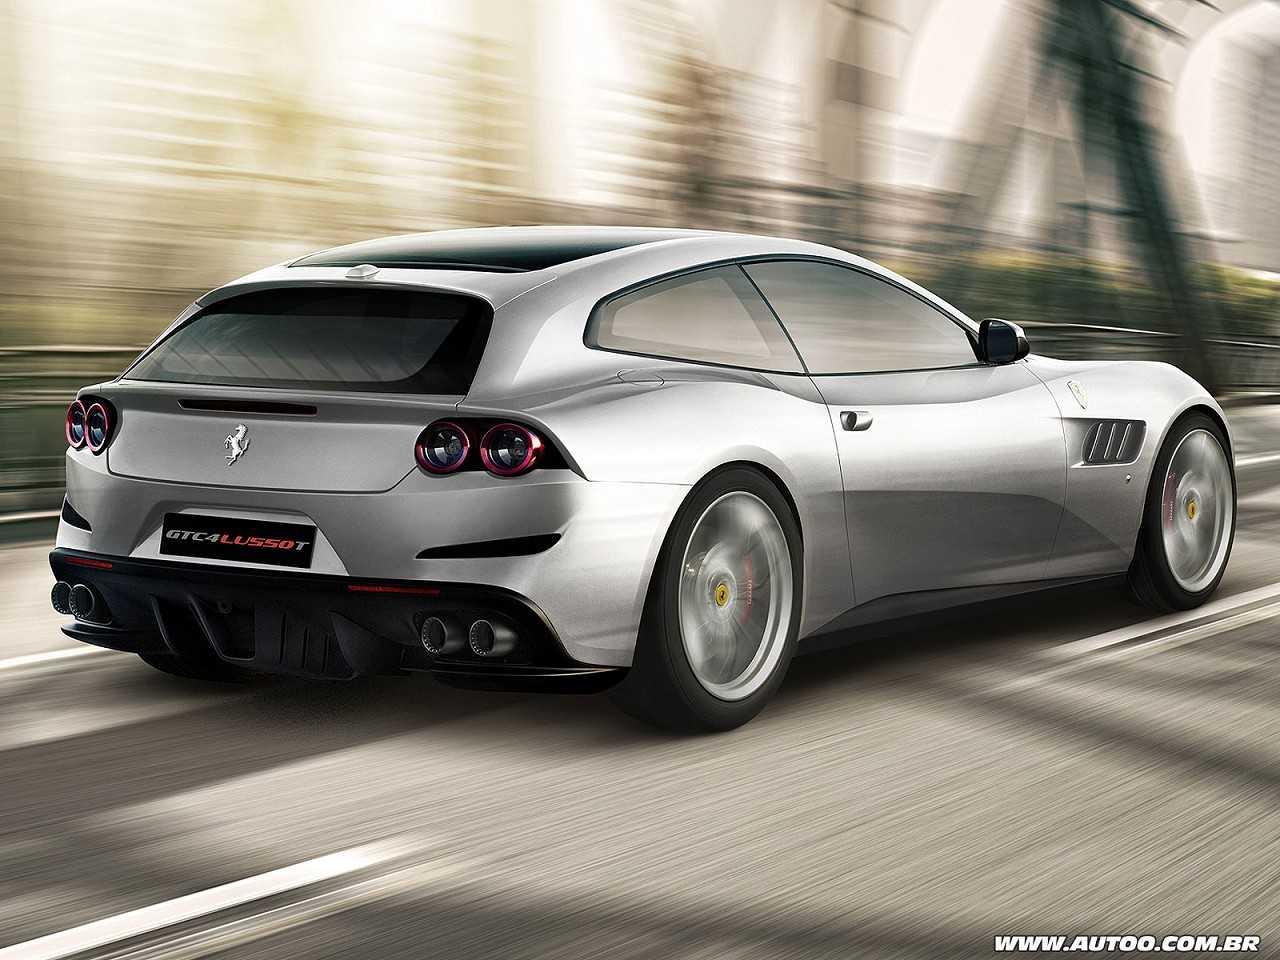 FerrariGTC4Lusso T 2017 - ângulo traseiro